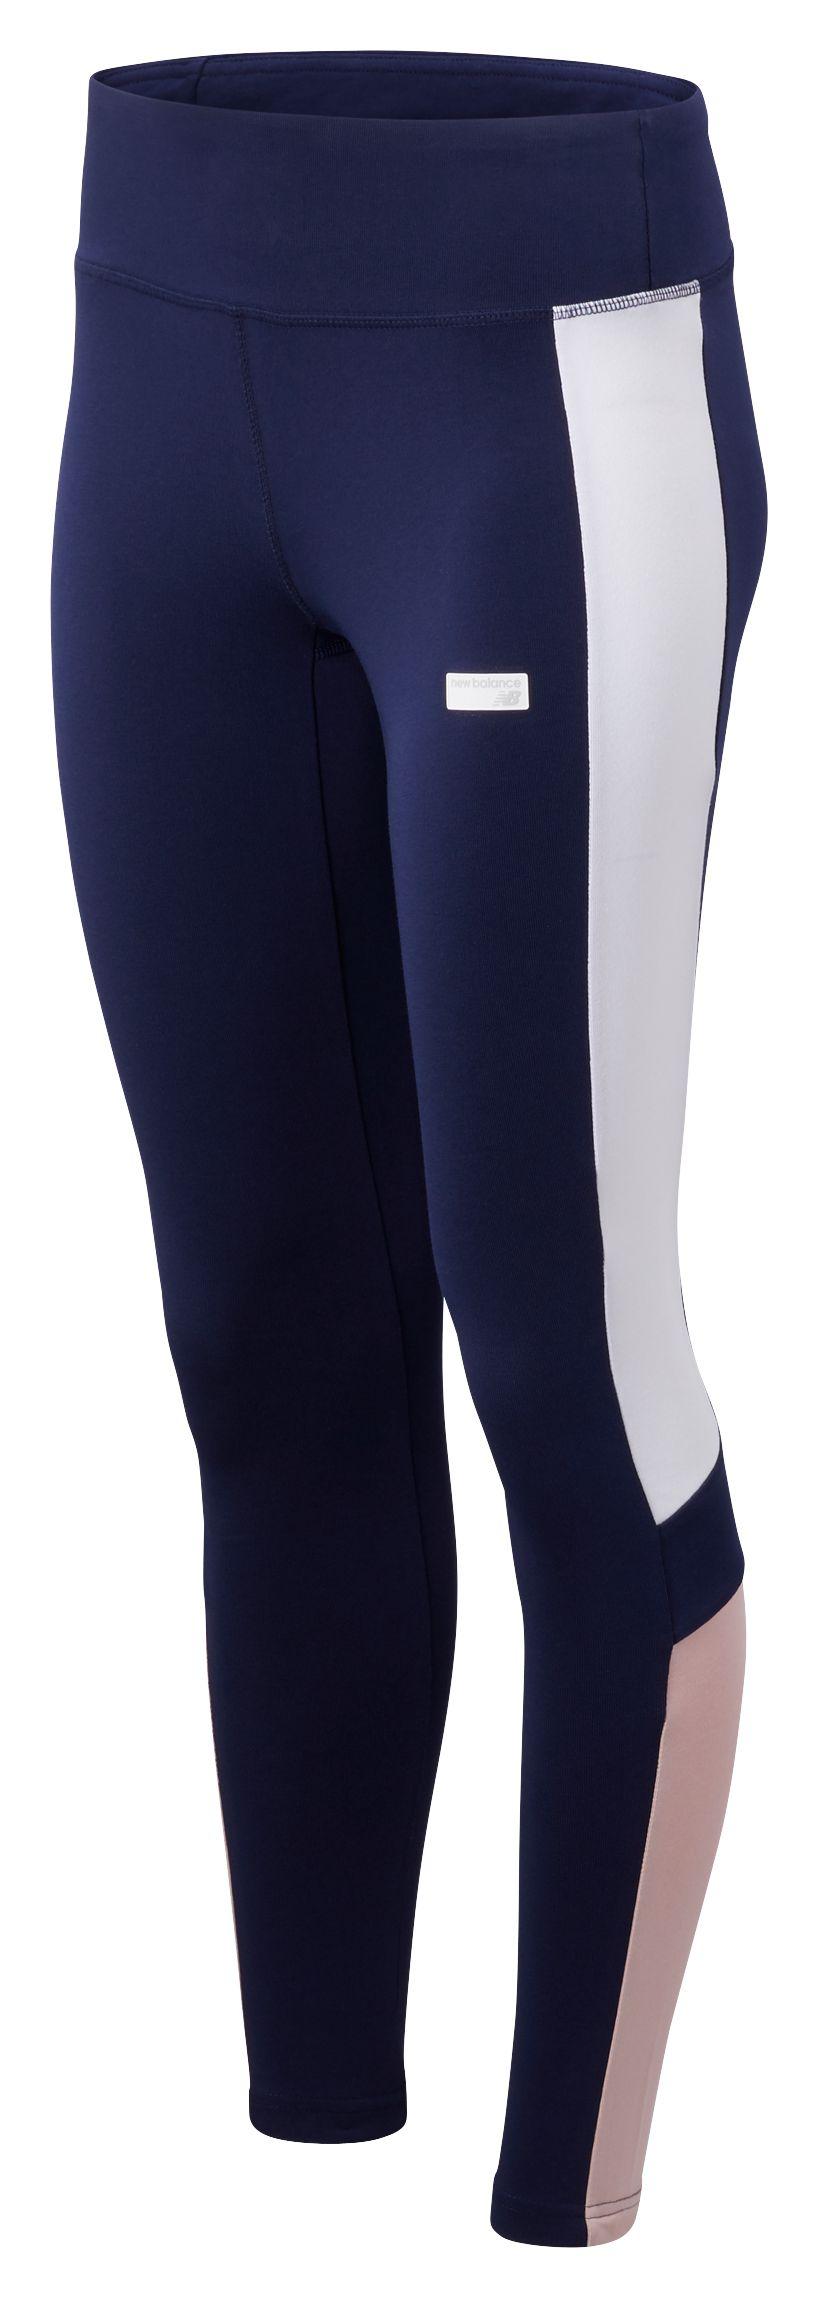 *Markdown*  Women's NB Athletics Classic Legging